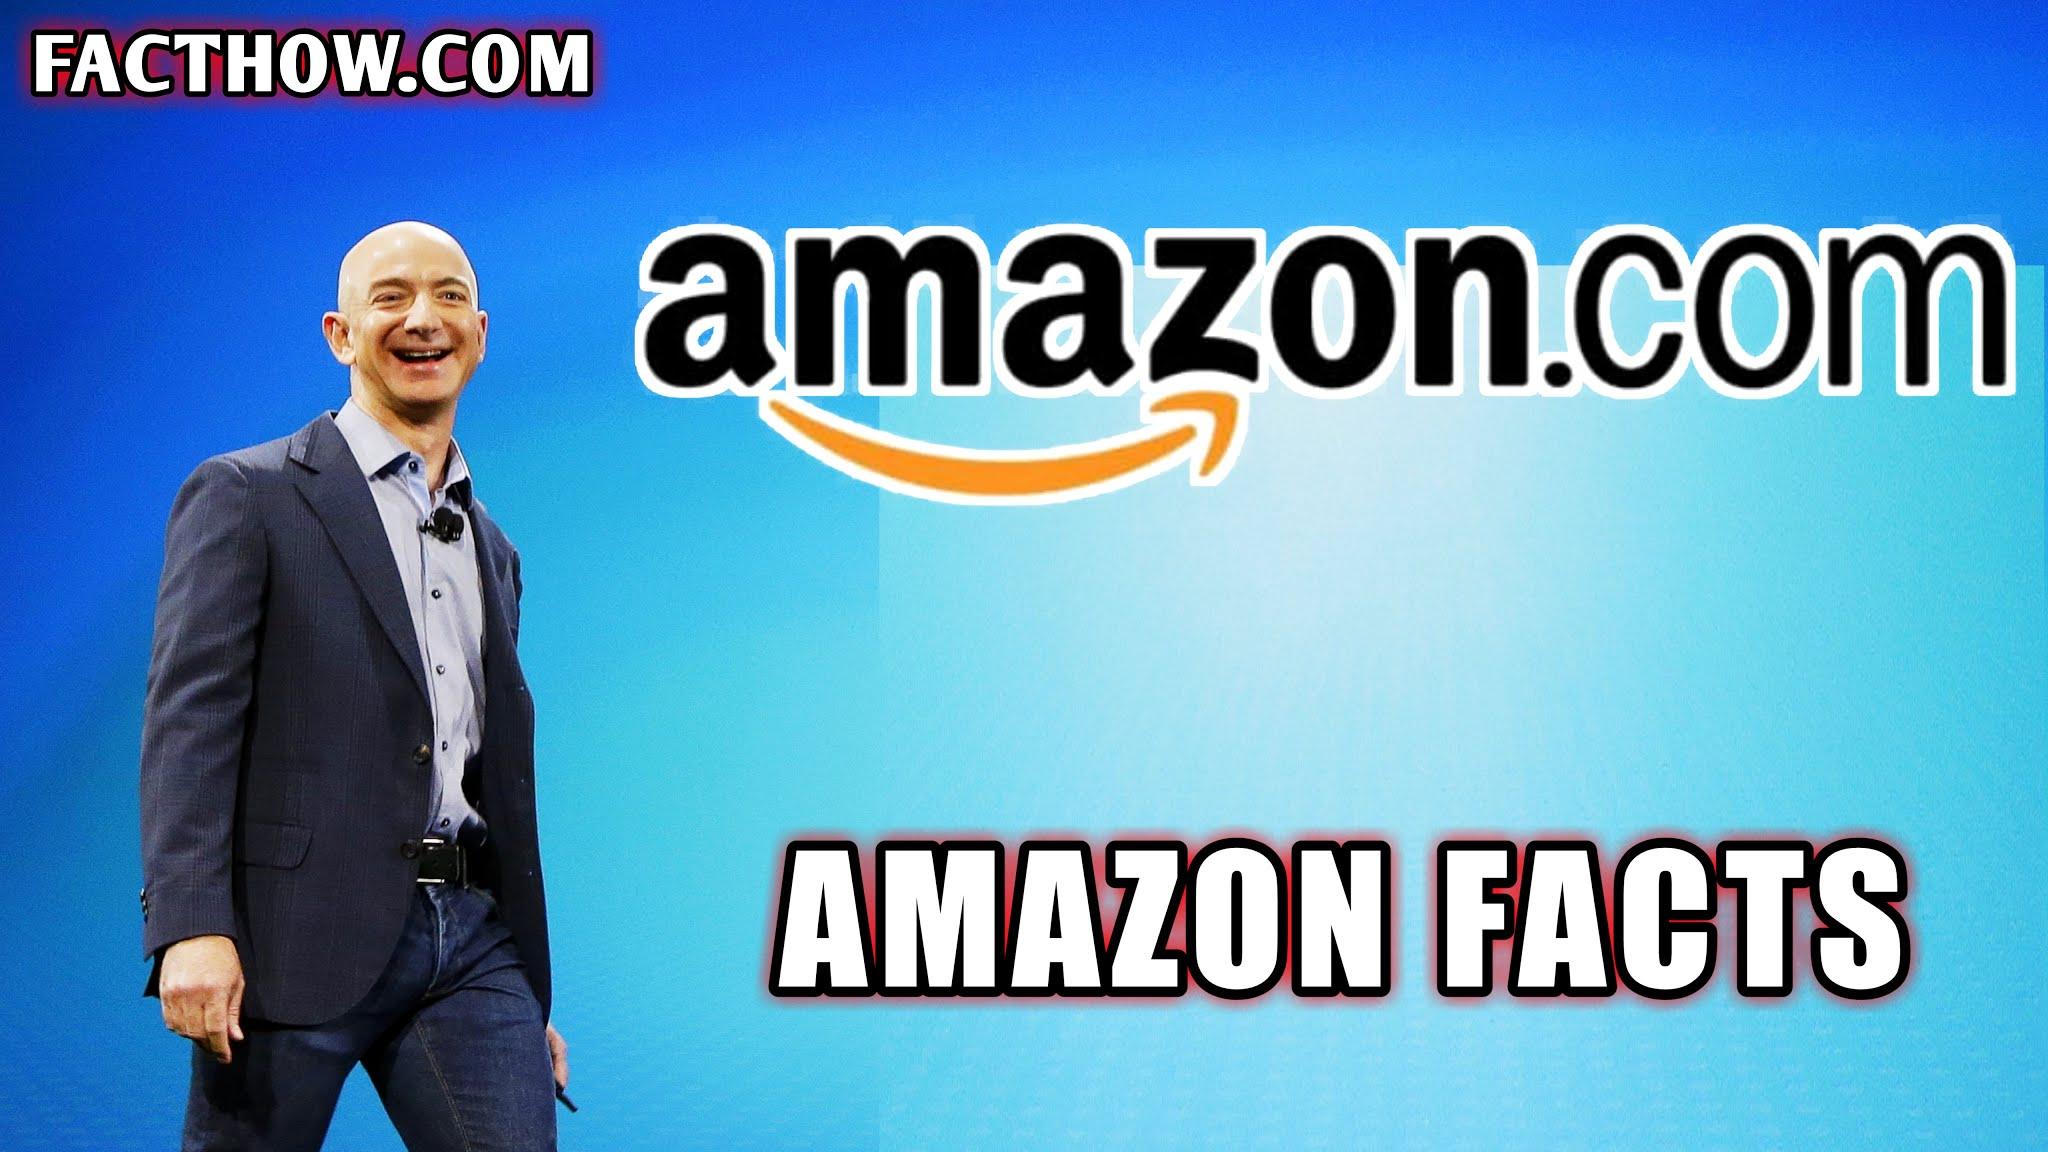 amazon-interesting-fun-facts-hindi-Amazon-prime-video-web-series-list-hindi-amazon-prime-video-releases-fact-how-facthow-jeff-bezos-richest-person-world